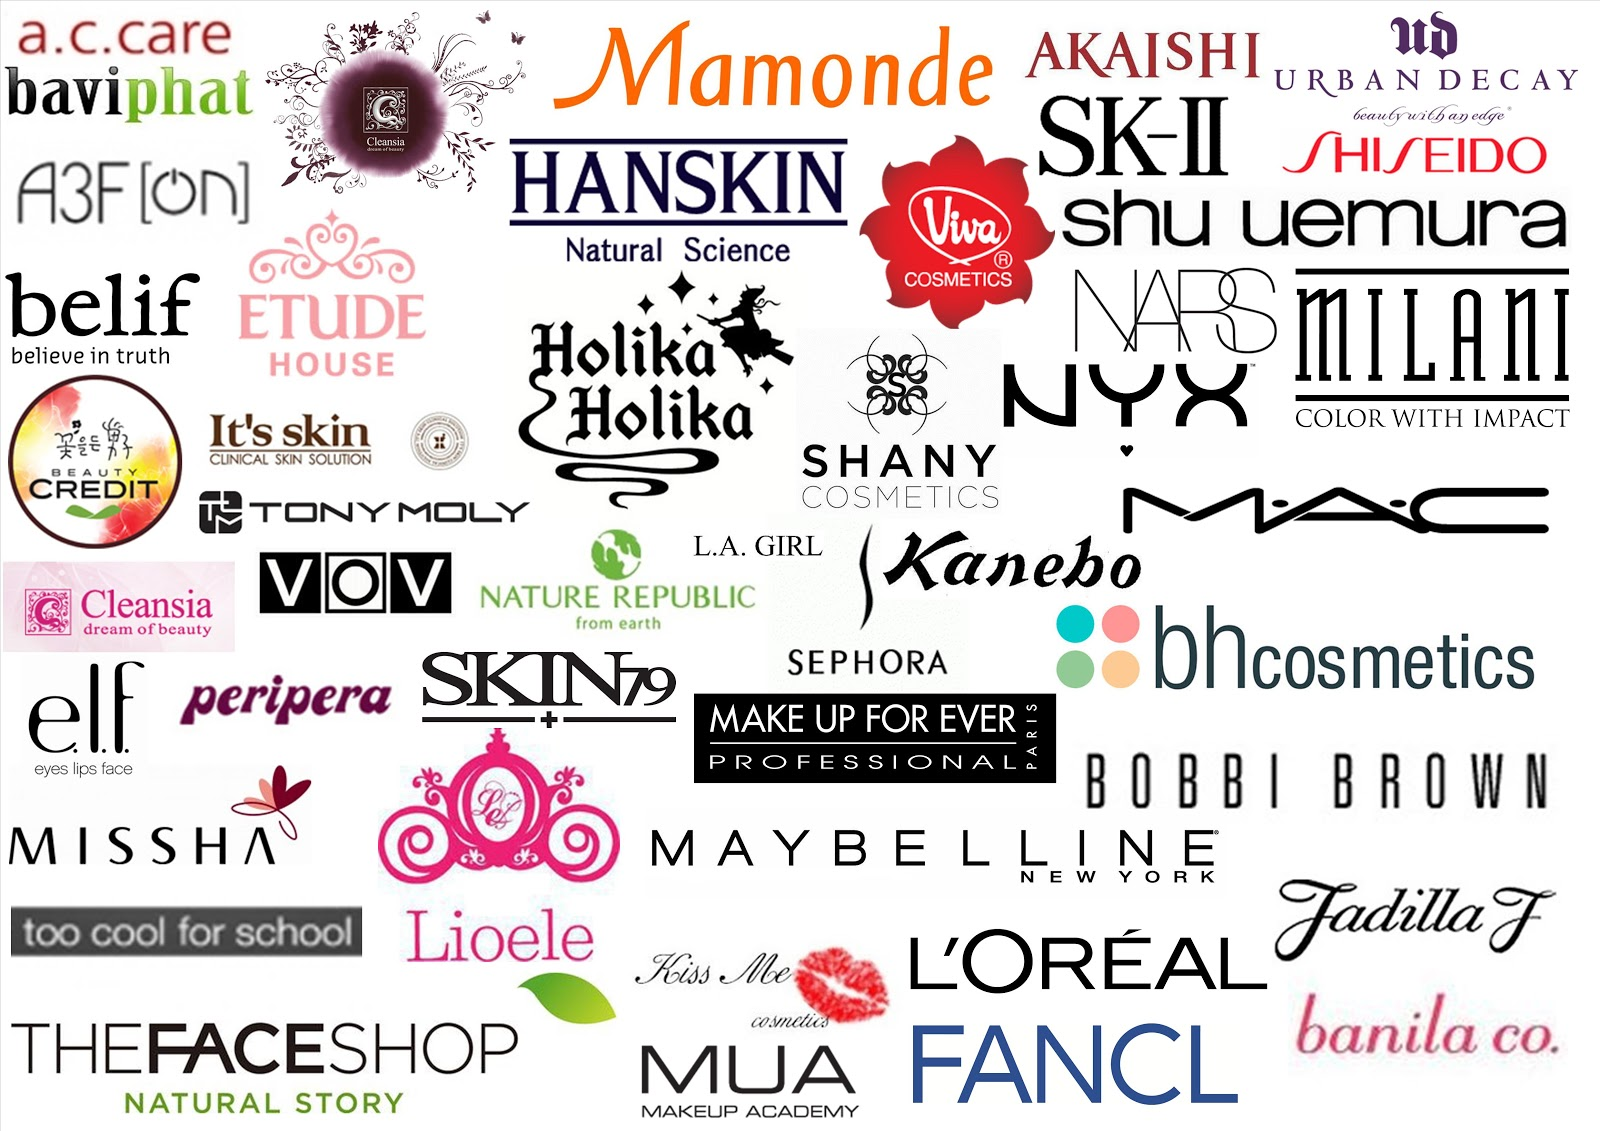 Promising Beauty: Battle of the Drugstore Make-up Brands ...  |Beauty Brand Logos